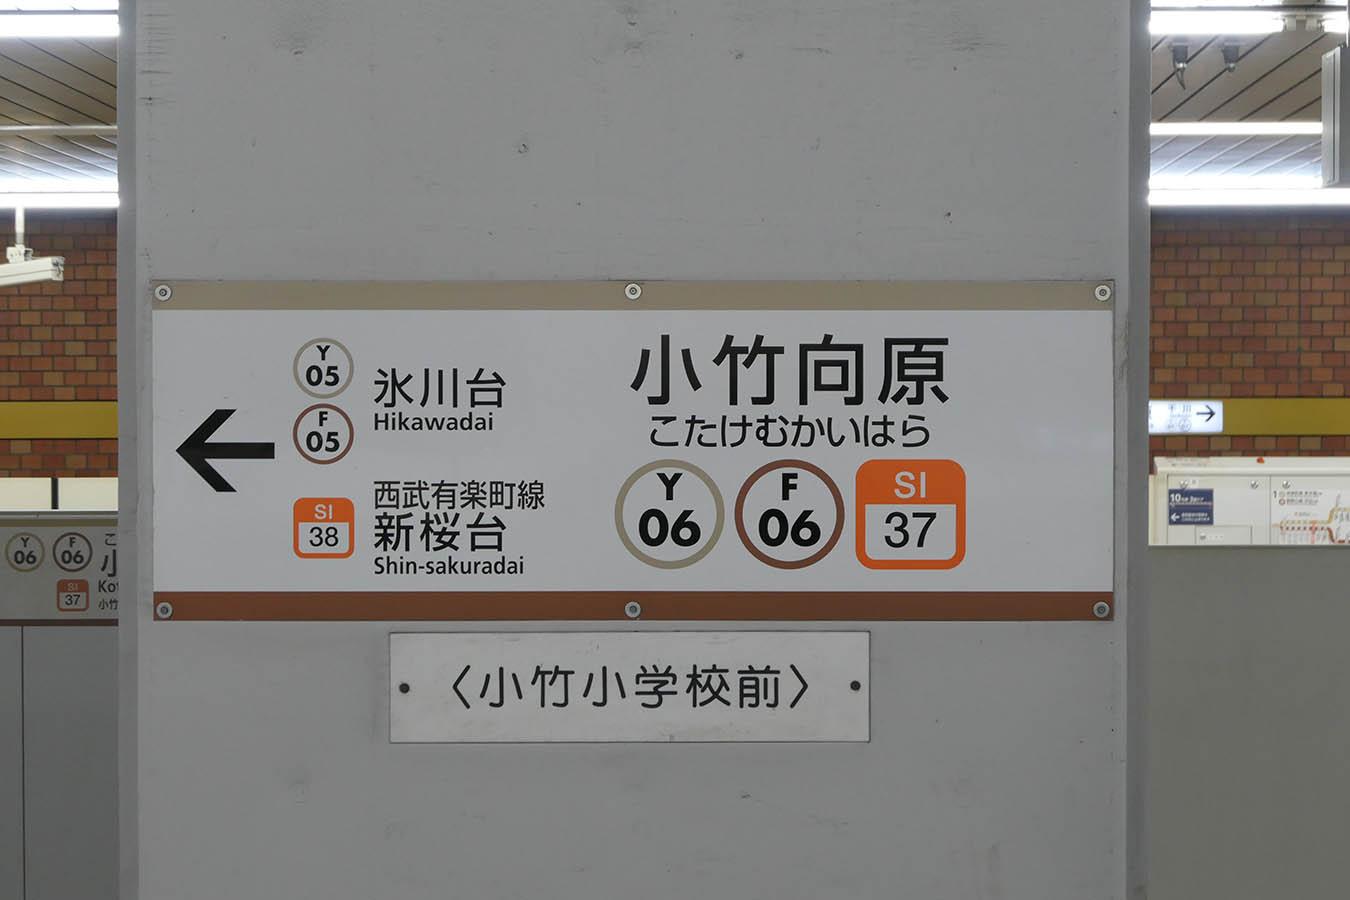 Y06_photo07.jpg